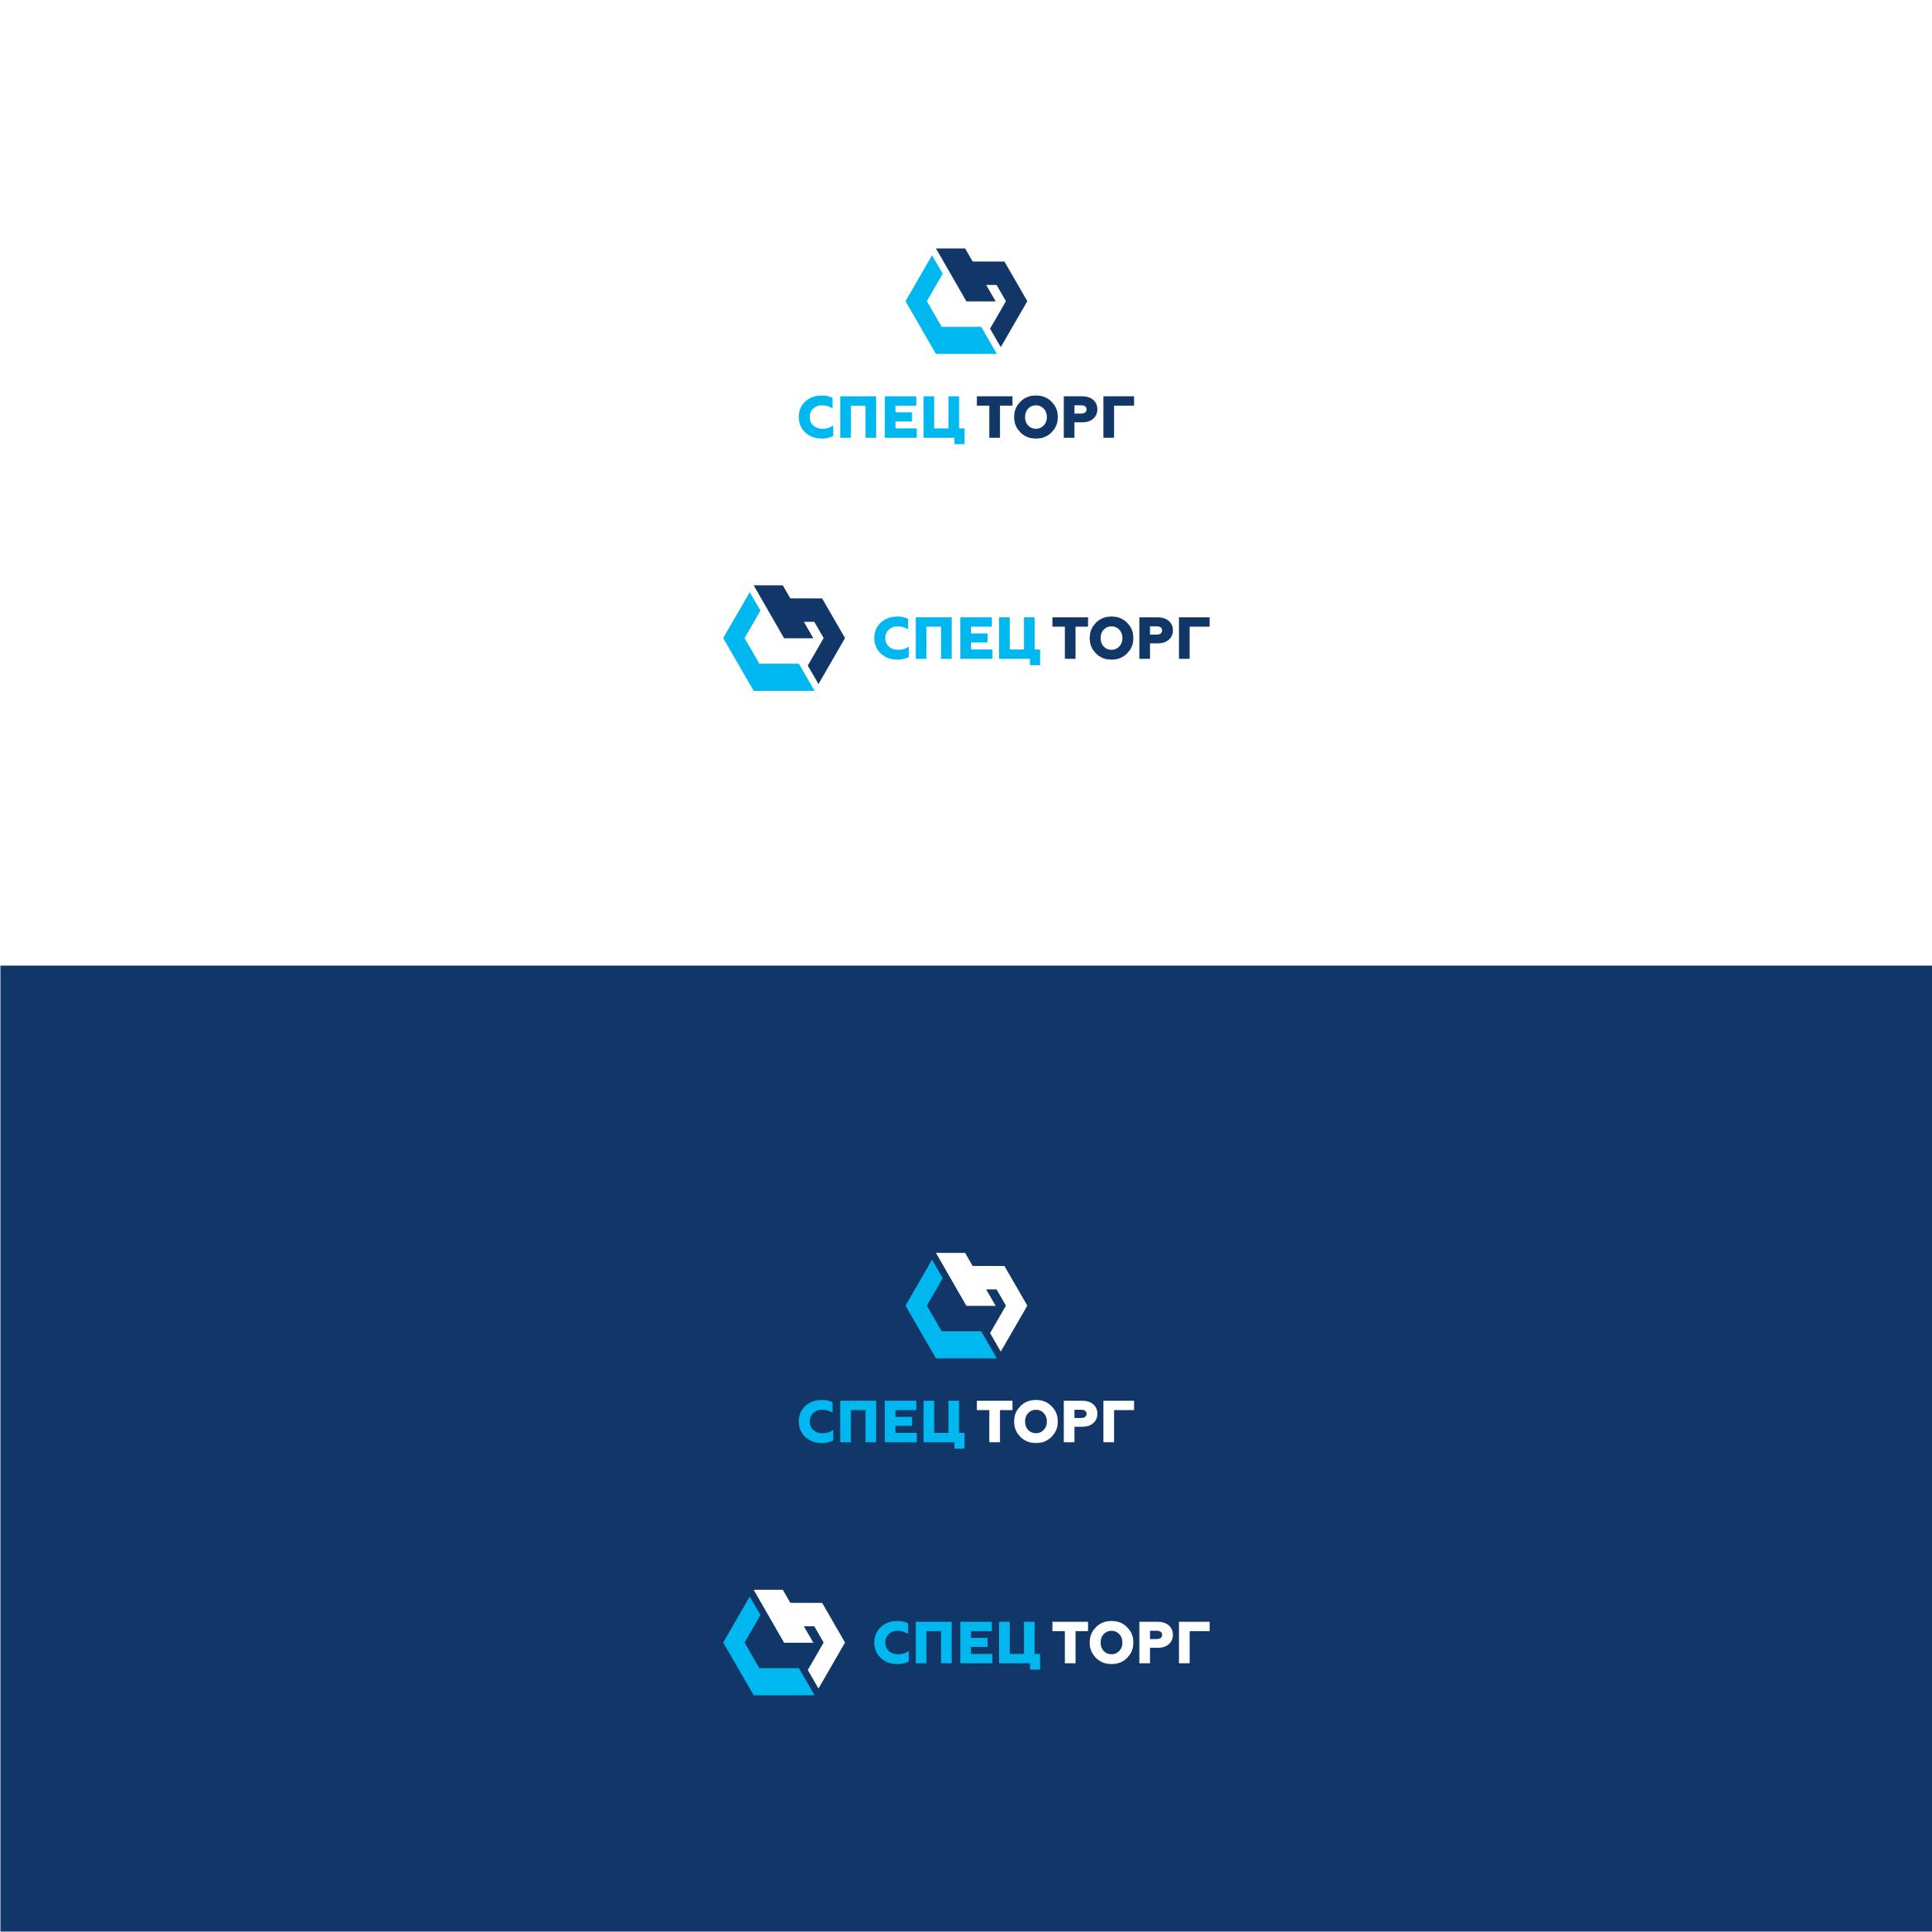 Разработать дизайн  логотипа компании фото f_9735dcefe68299f0.png